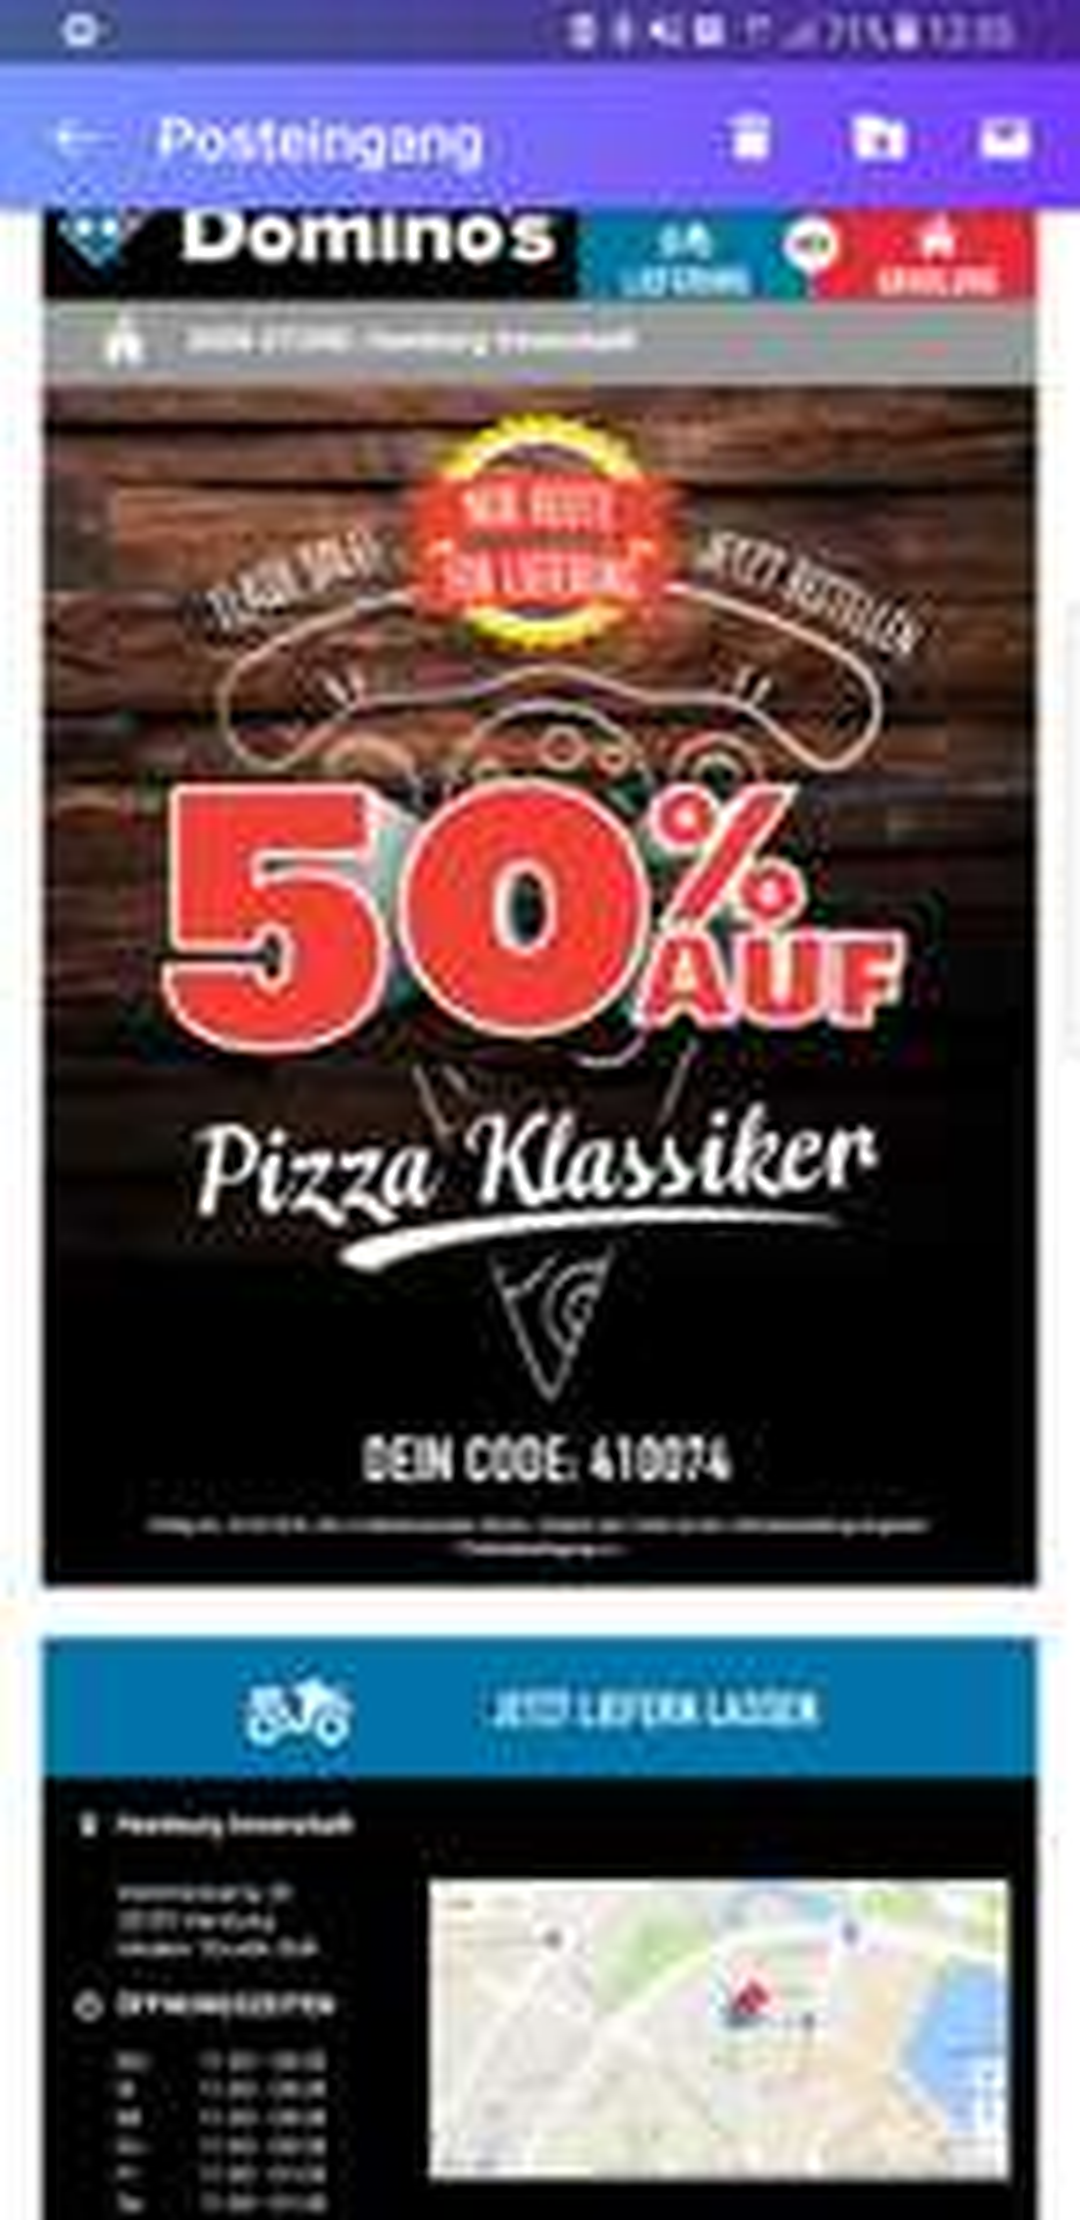 Dominos Pizza Flashsale (Lokal?)